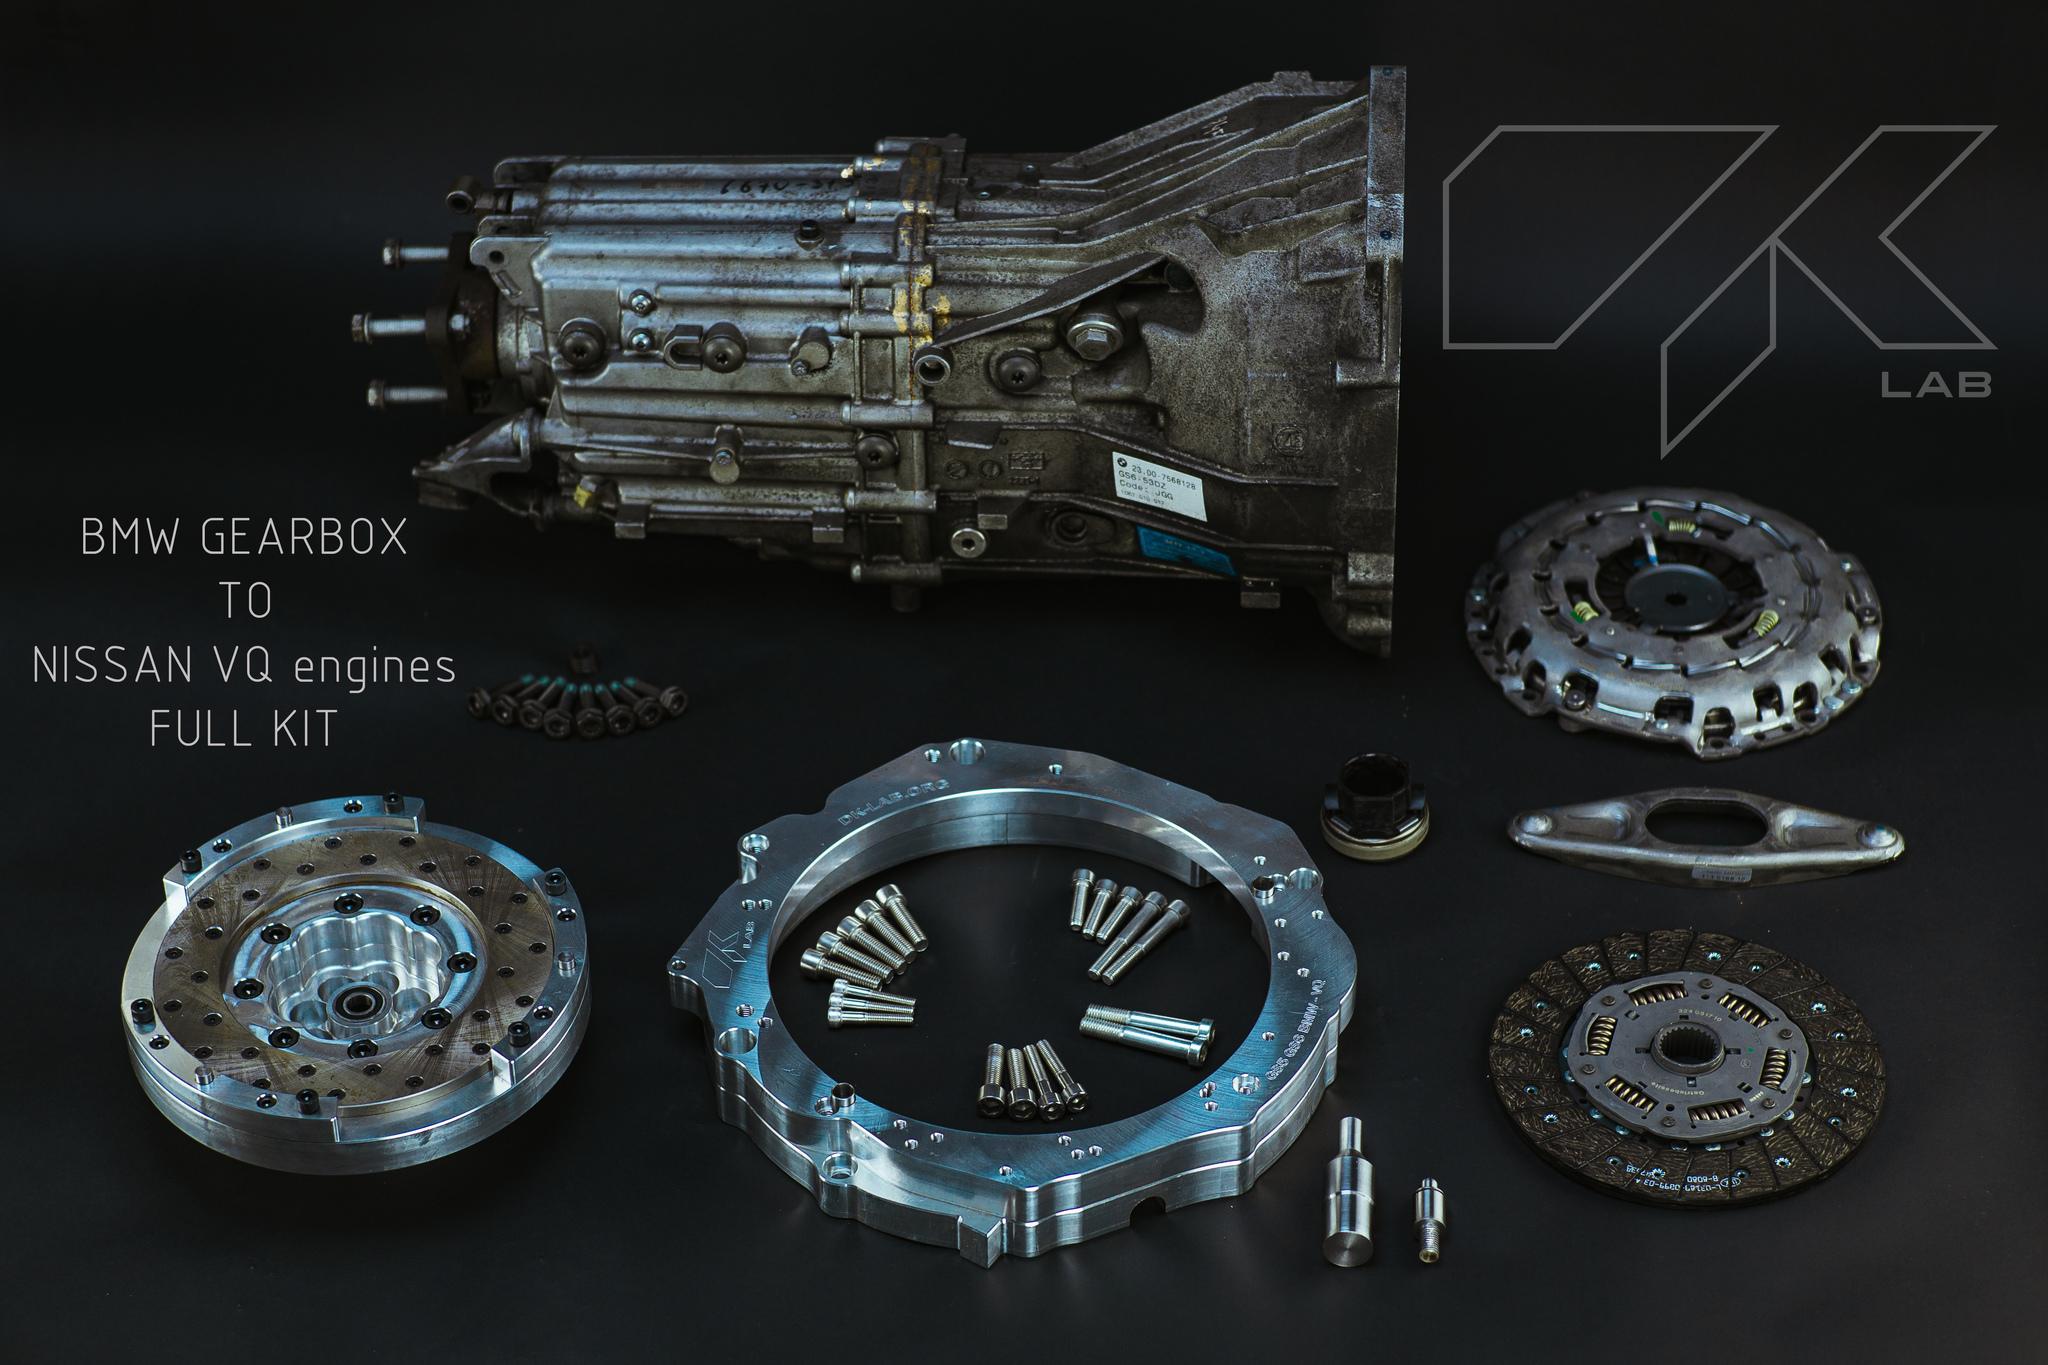 DK_LAB VQ30DET СВАП КОМПЛЕКТ НА BMW КПП